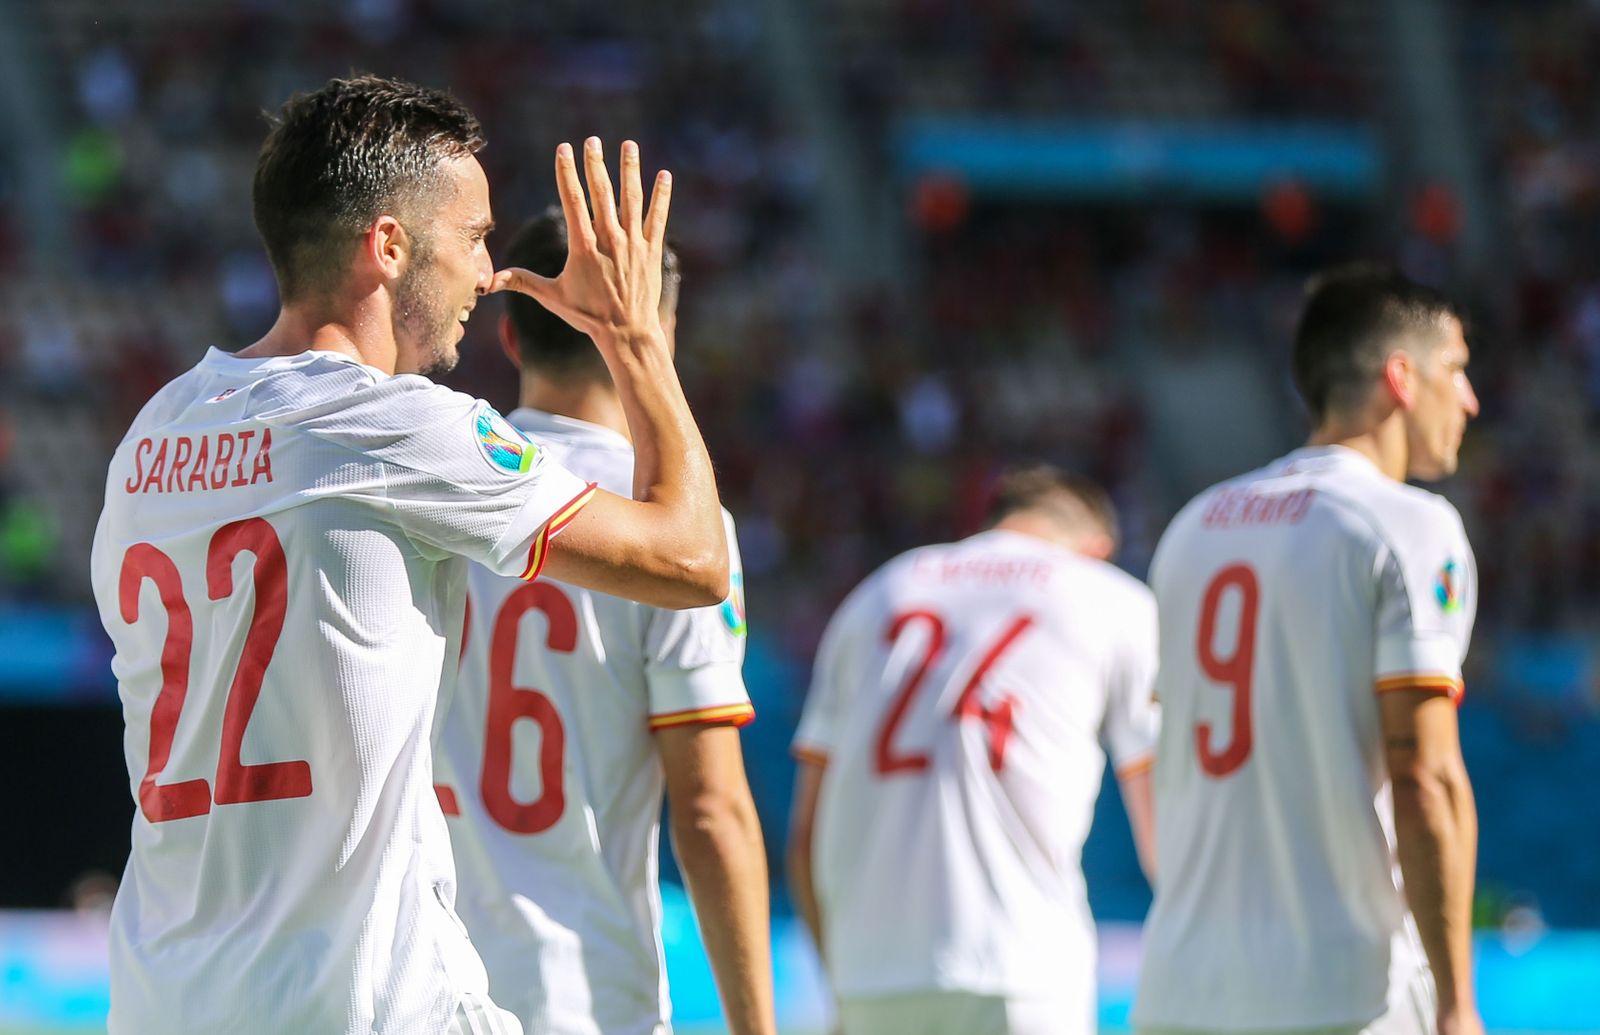 Fußball EM - Slowakei - Spanien